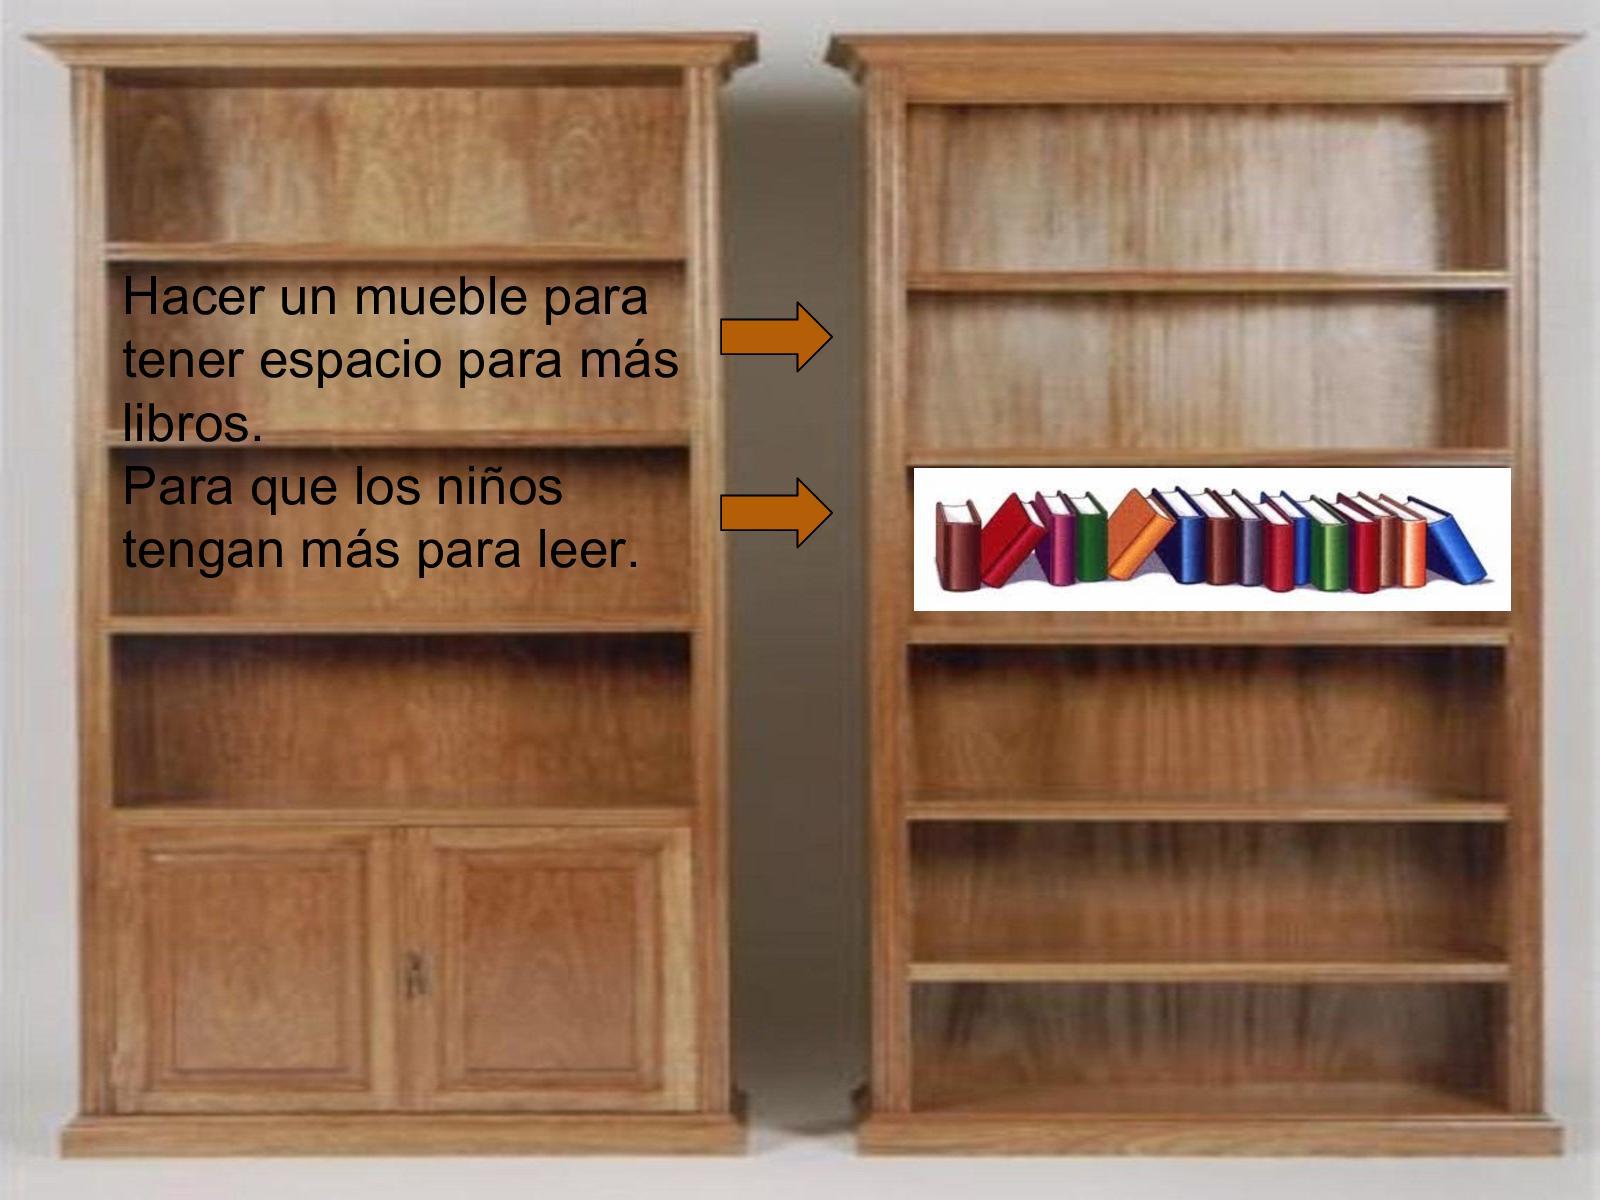 Muebles Para Libros Ninos.Calameo Dibujo Mueble